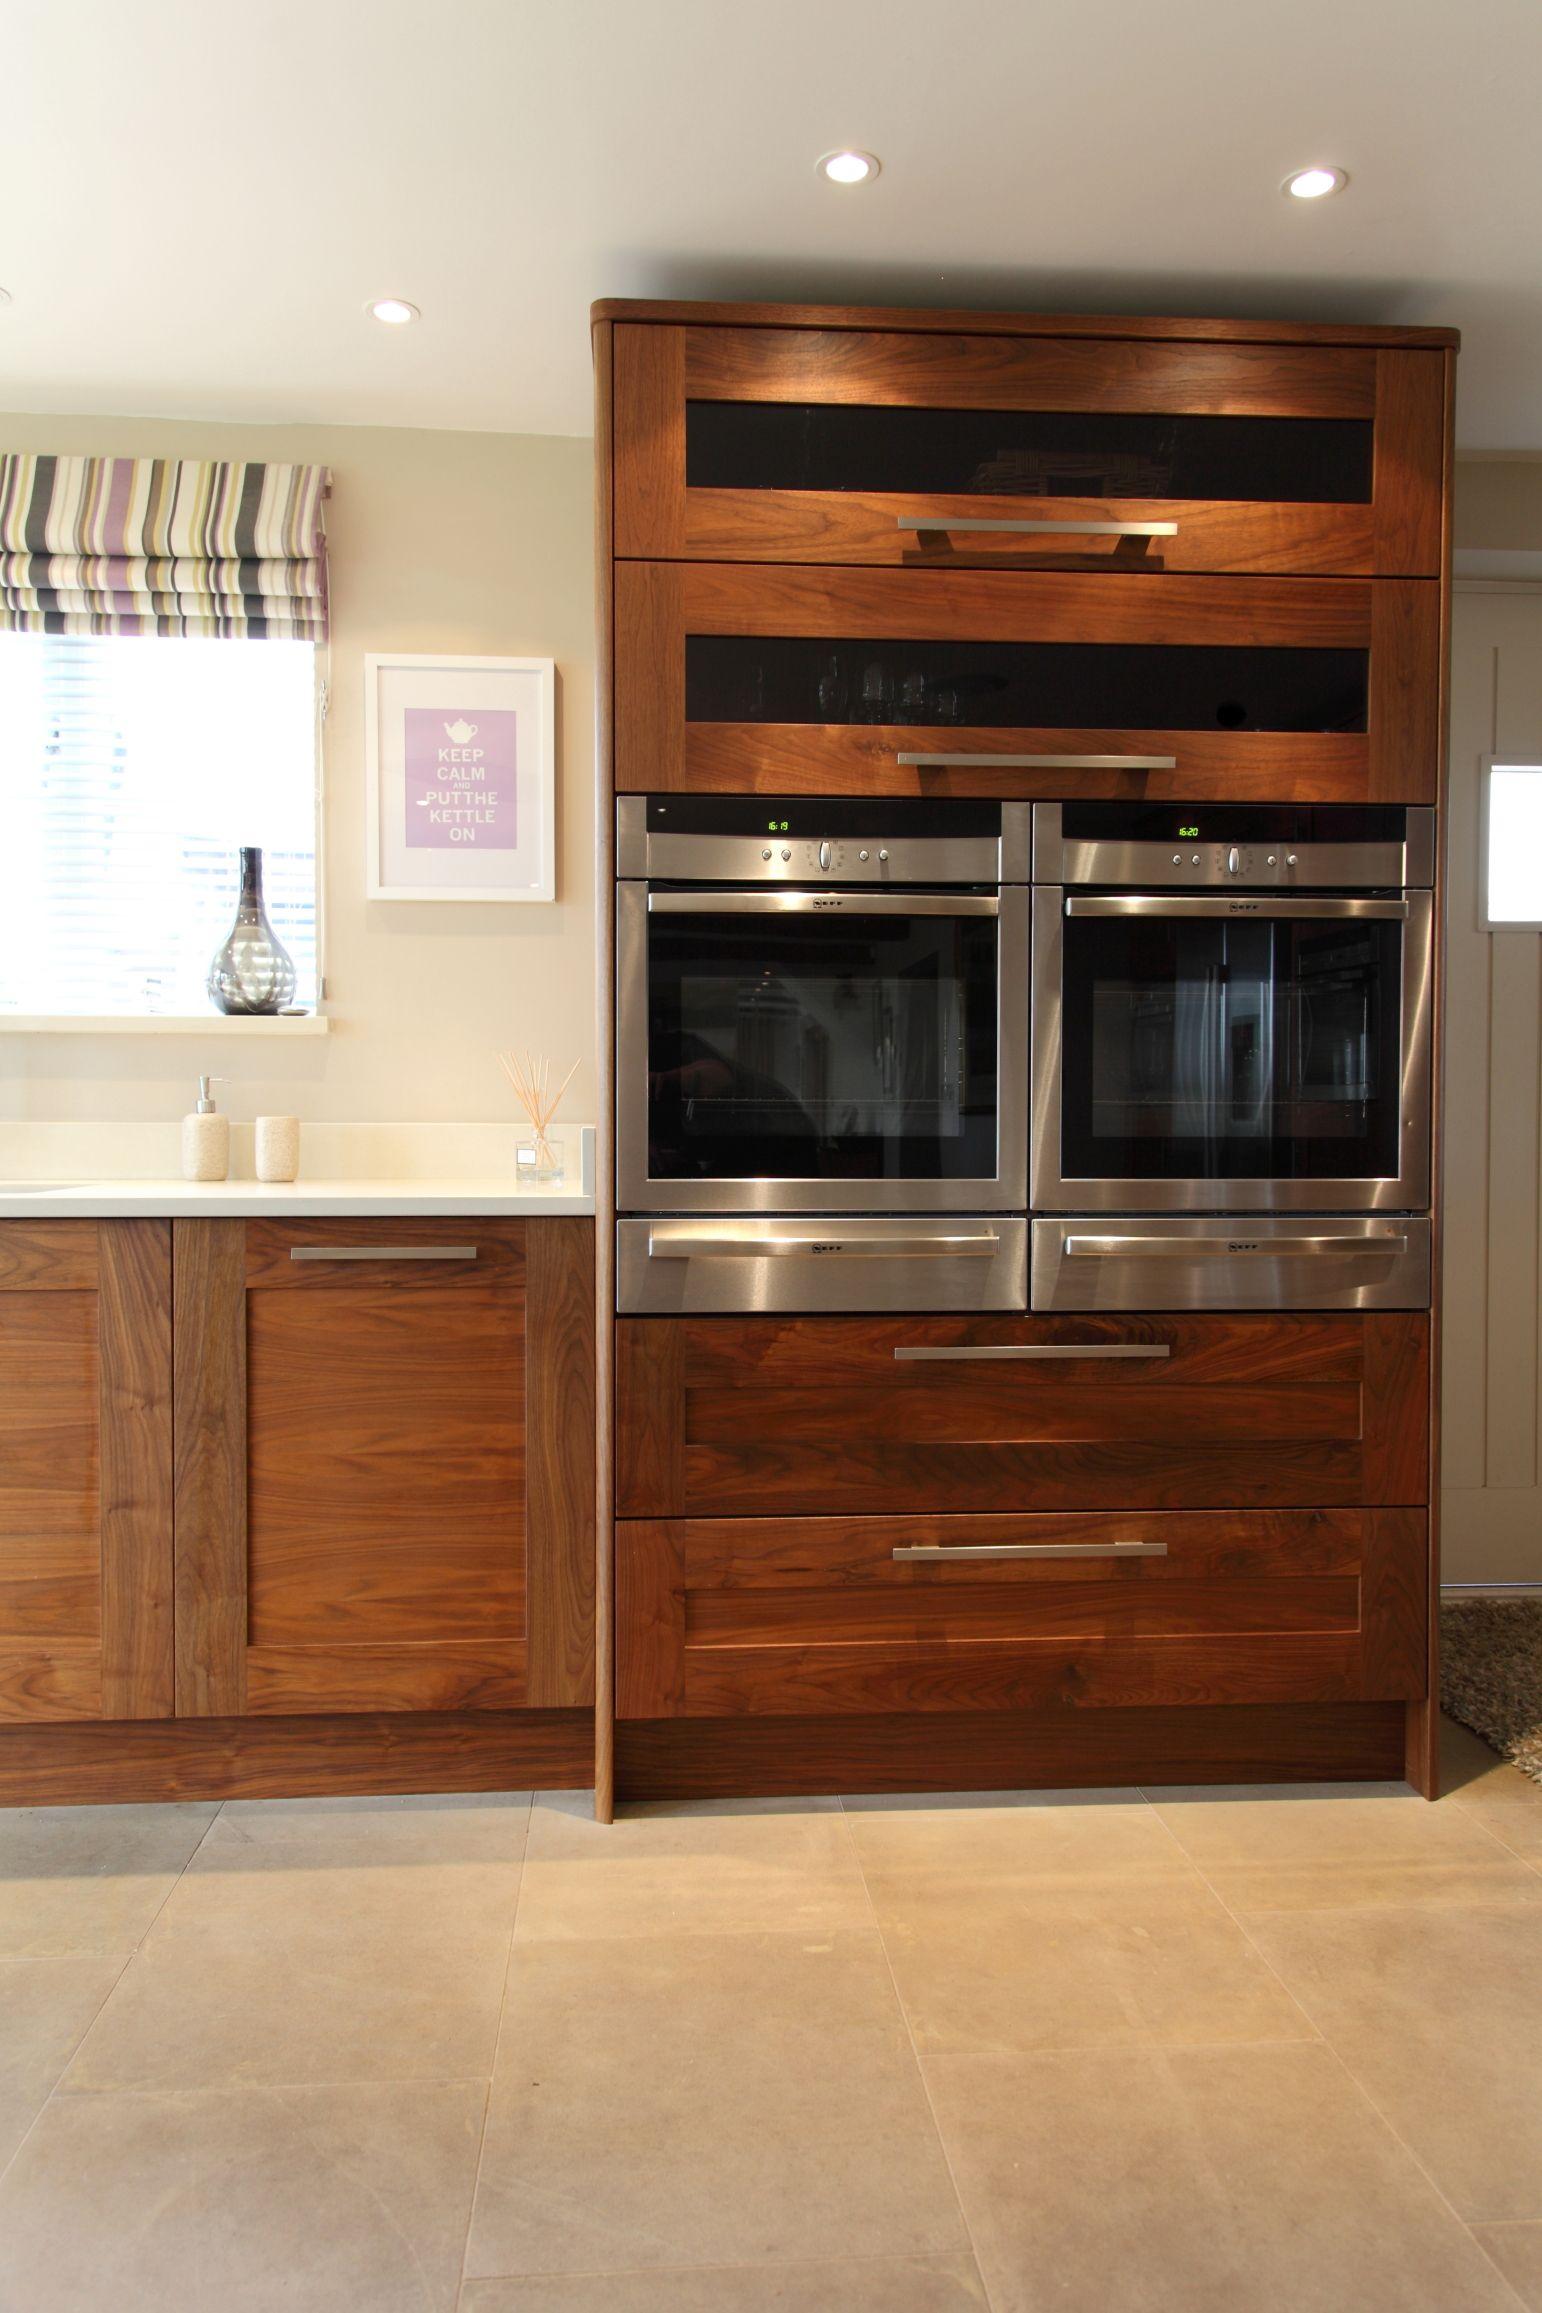 2 X Neff Single Ovens Side By Side Warming Drawers Below Super Wide Pan Drawers Below Warming Draw Kitchen Design Color Kitchen Design Kitchen Cabinet Design